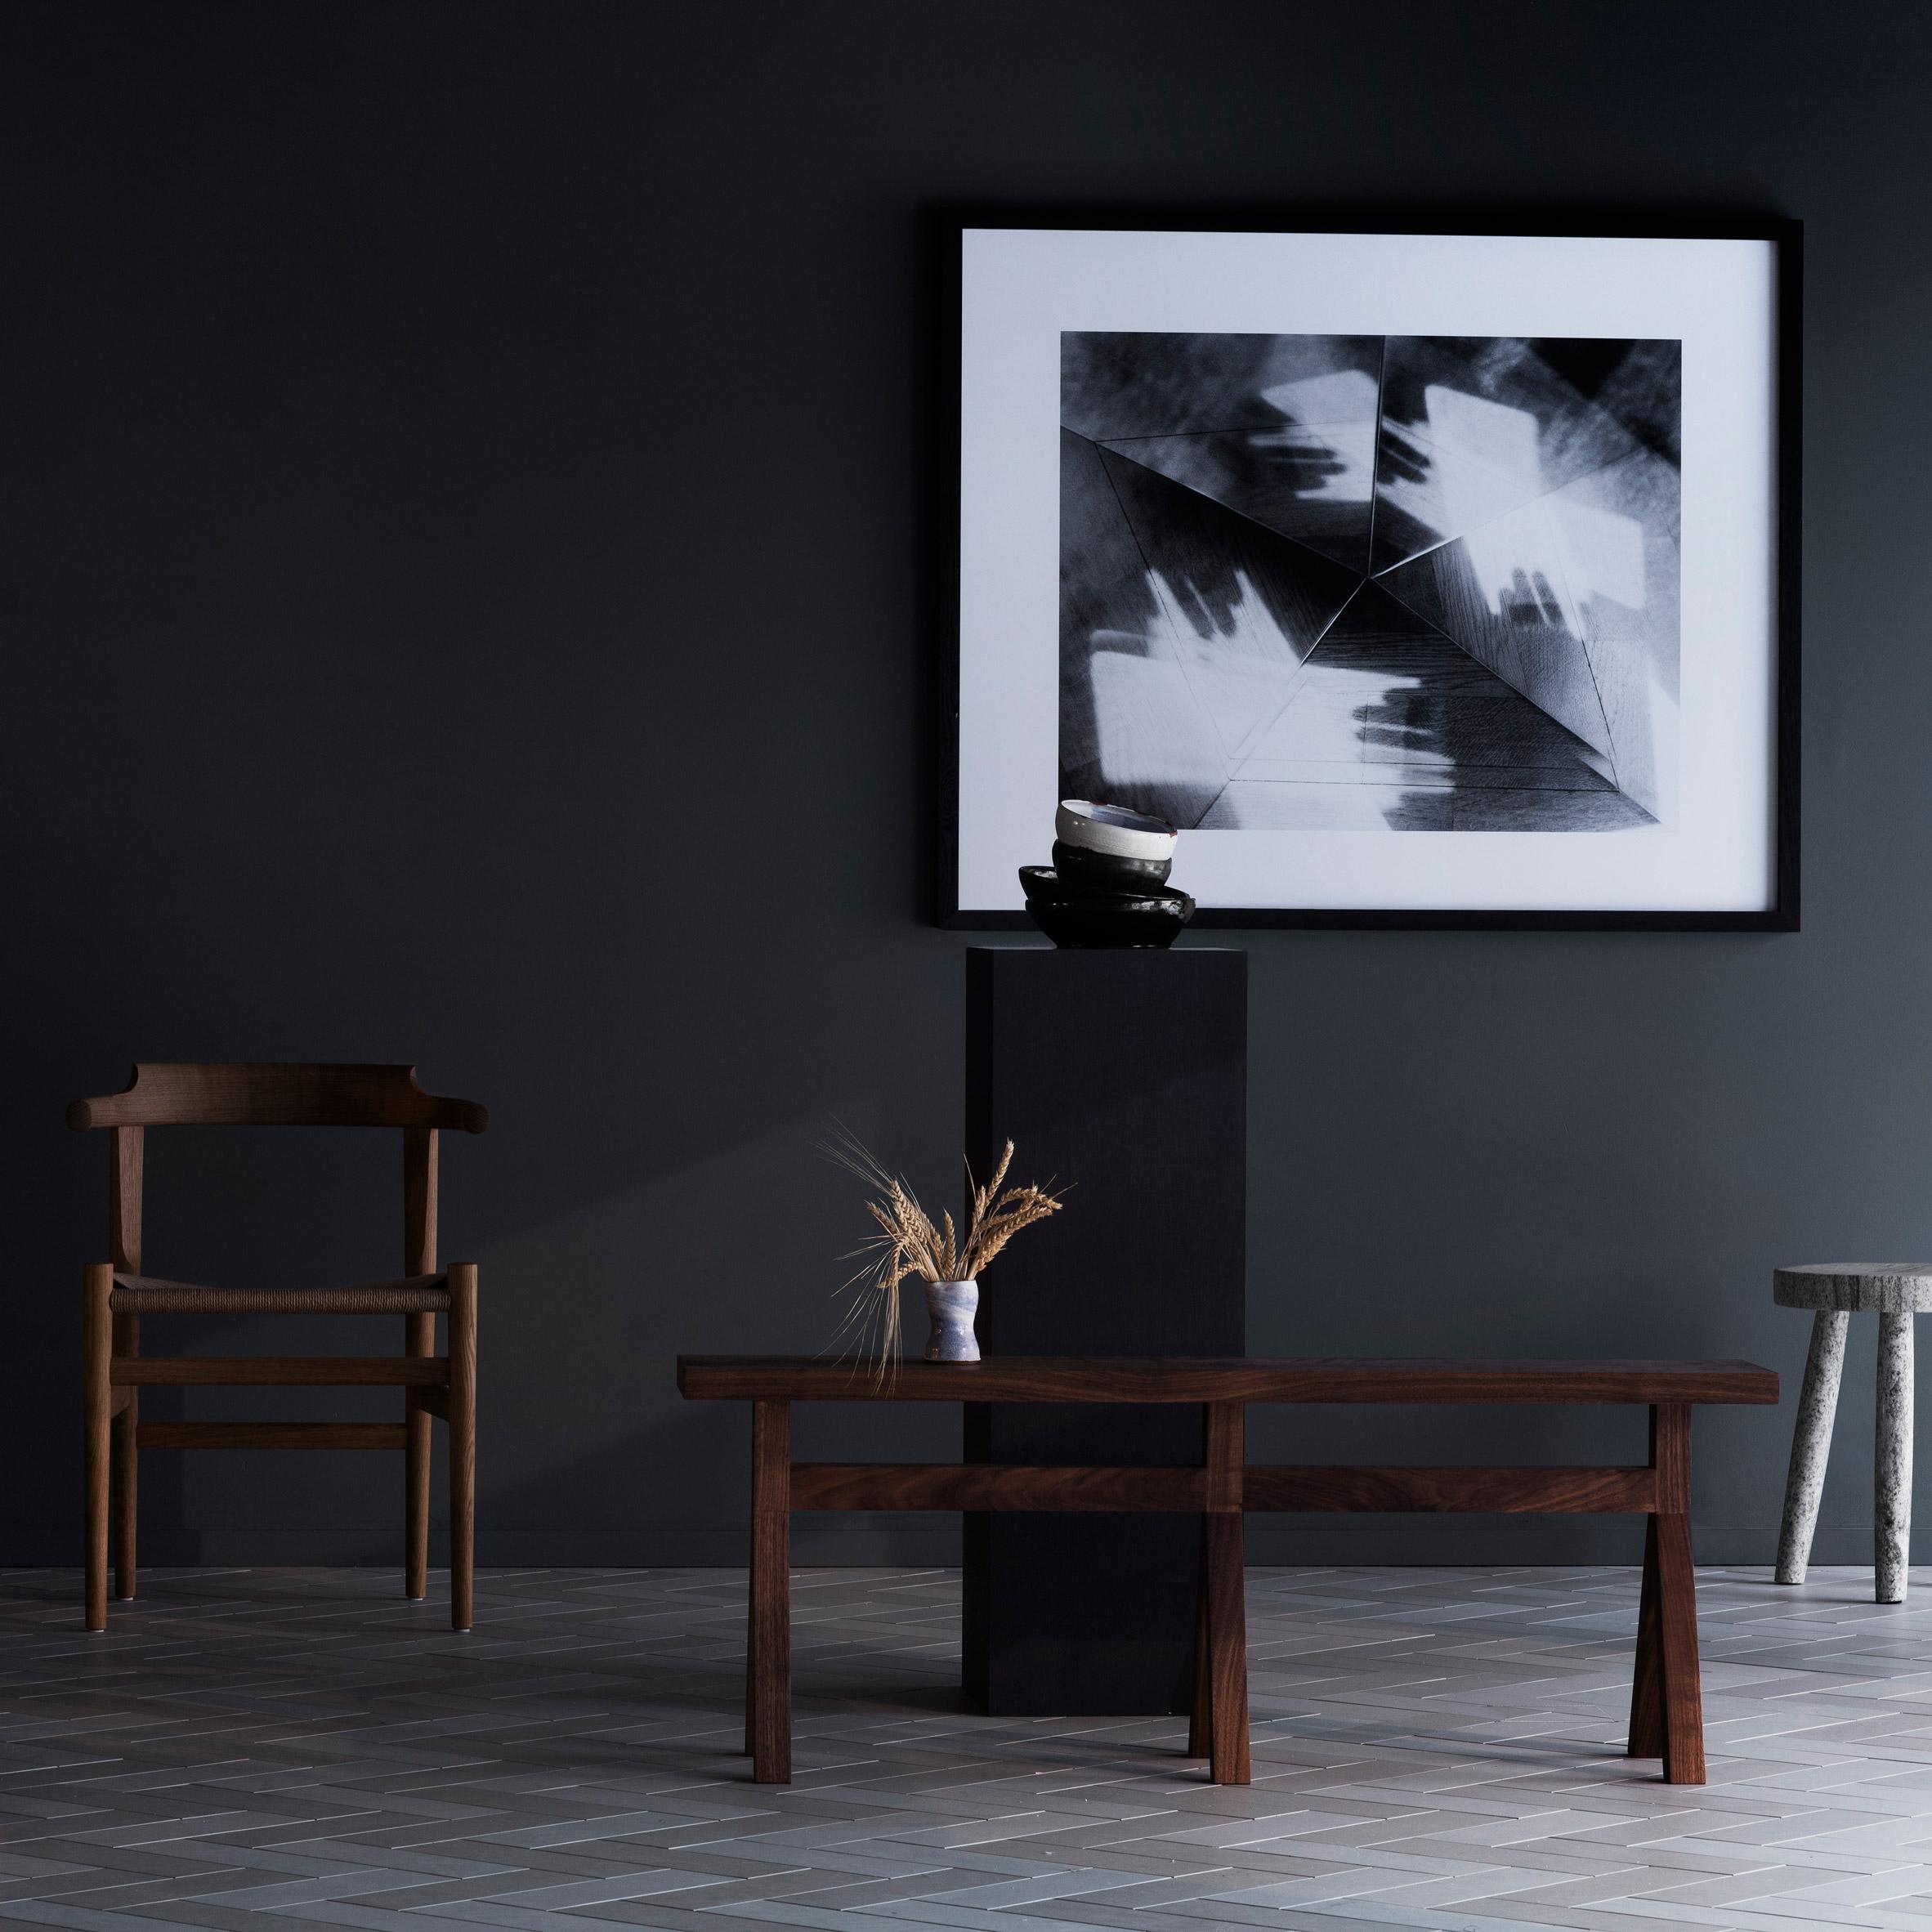 Stockholm S Alma Creative Space By Tham Videgau030ard Is Filled With Custom Furnituretrue